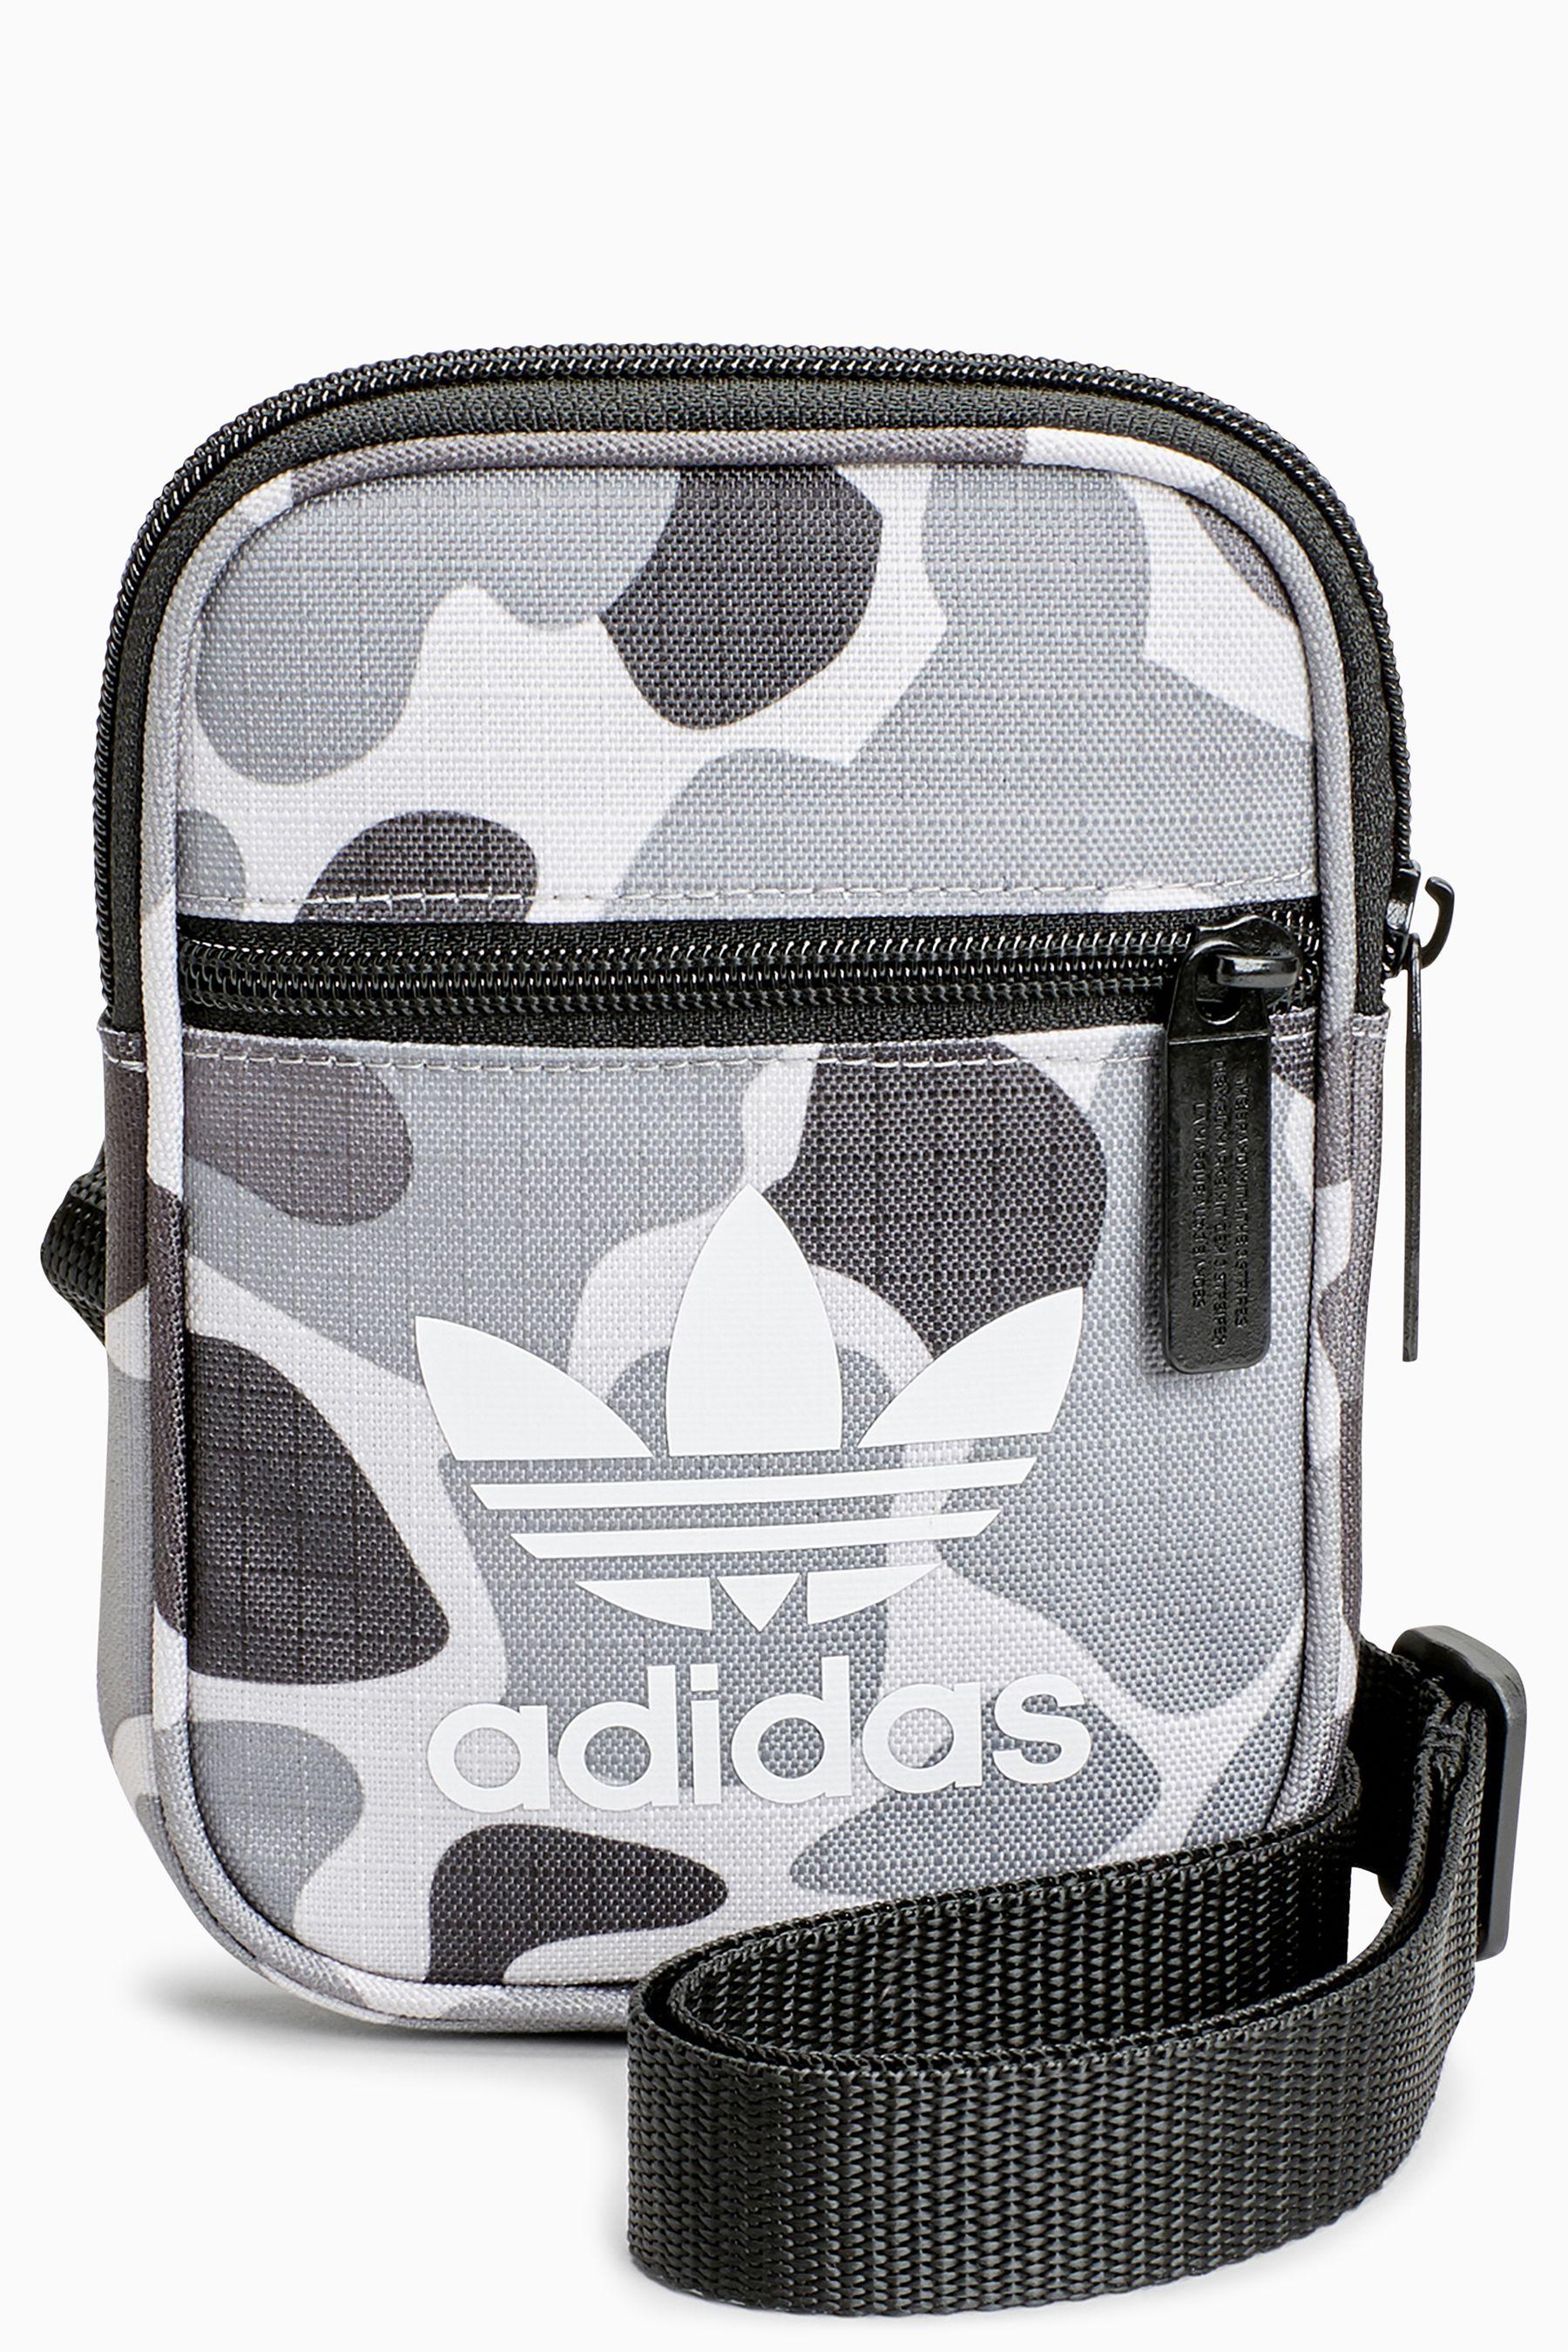 Mens adidas Originals Trefoil Festival Bag - Grey in 2019  1ebf94324bb47